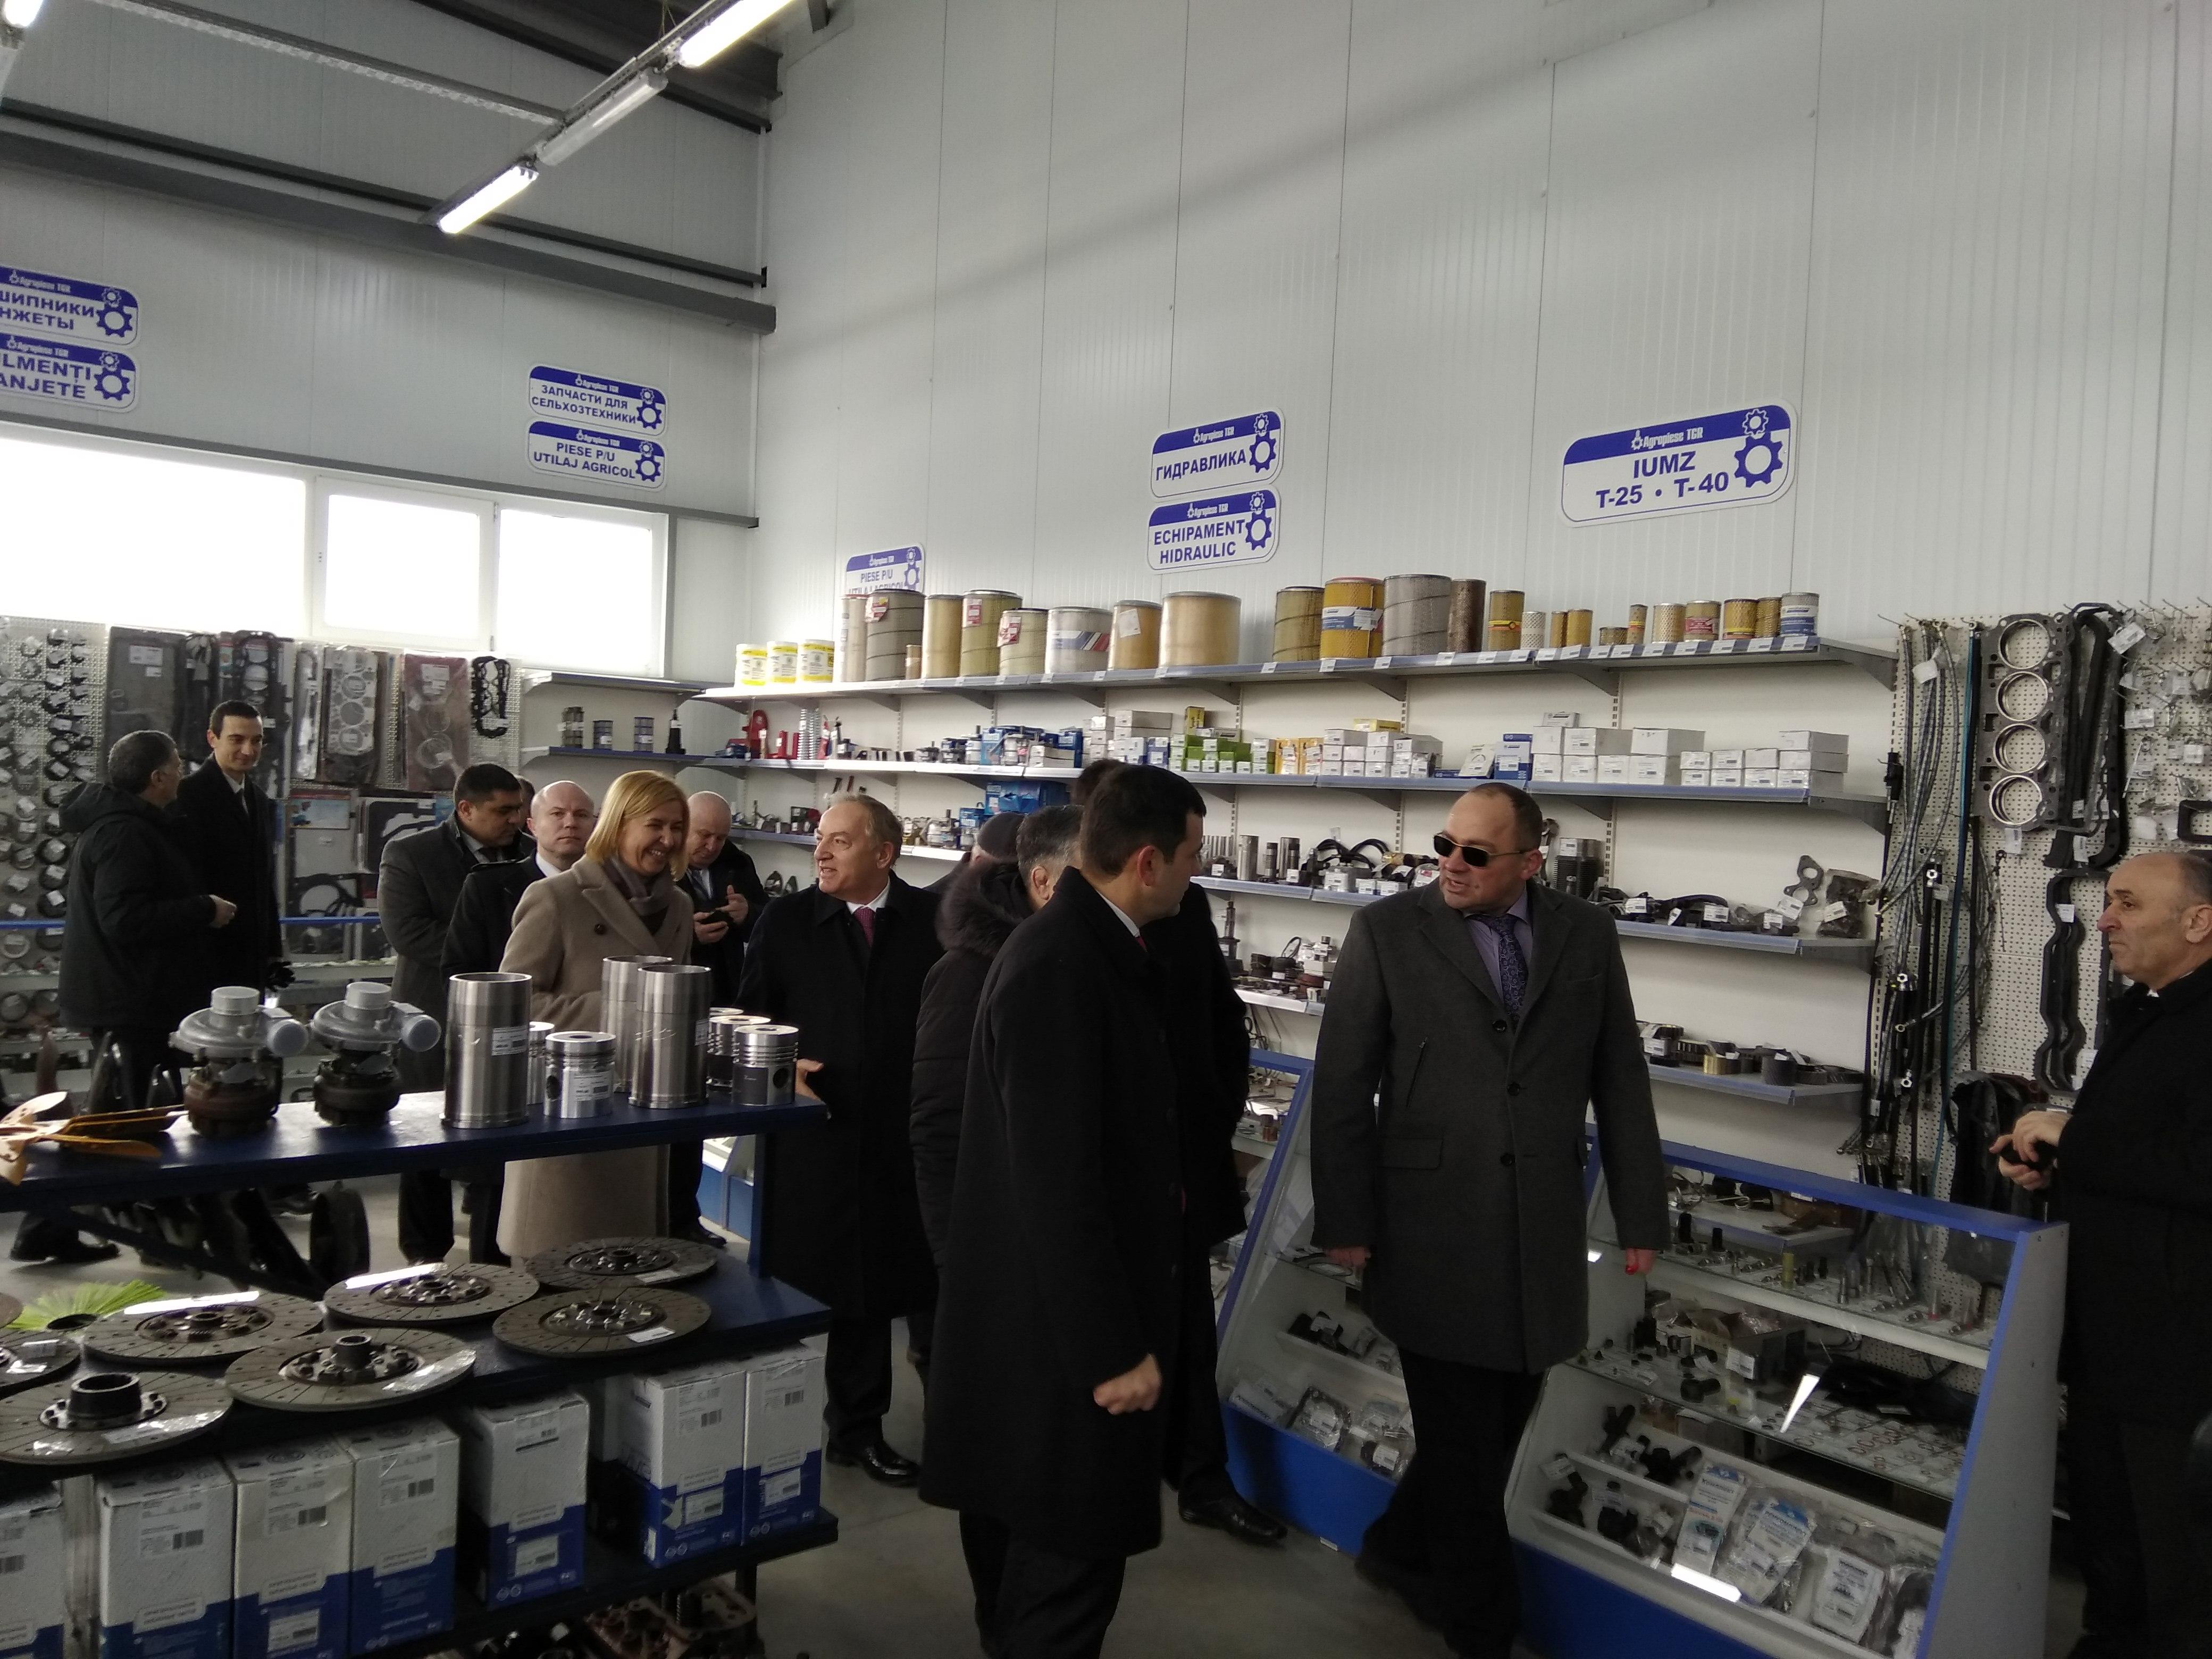 vizita gaburici la comrat, tehnologii in agricultura, agricultura moldoveneasca, chiril gaburici minister